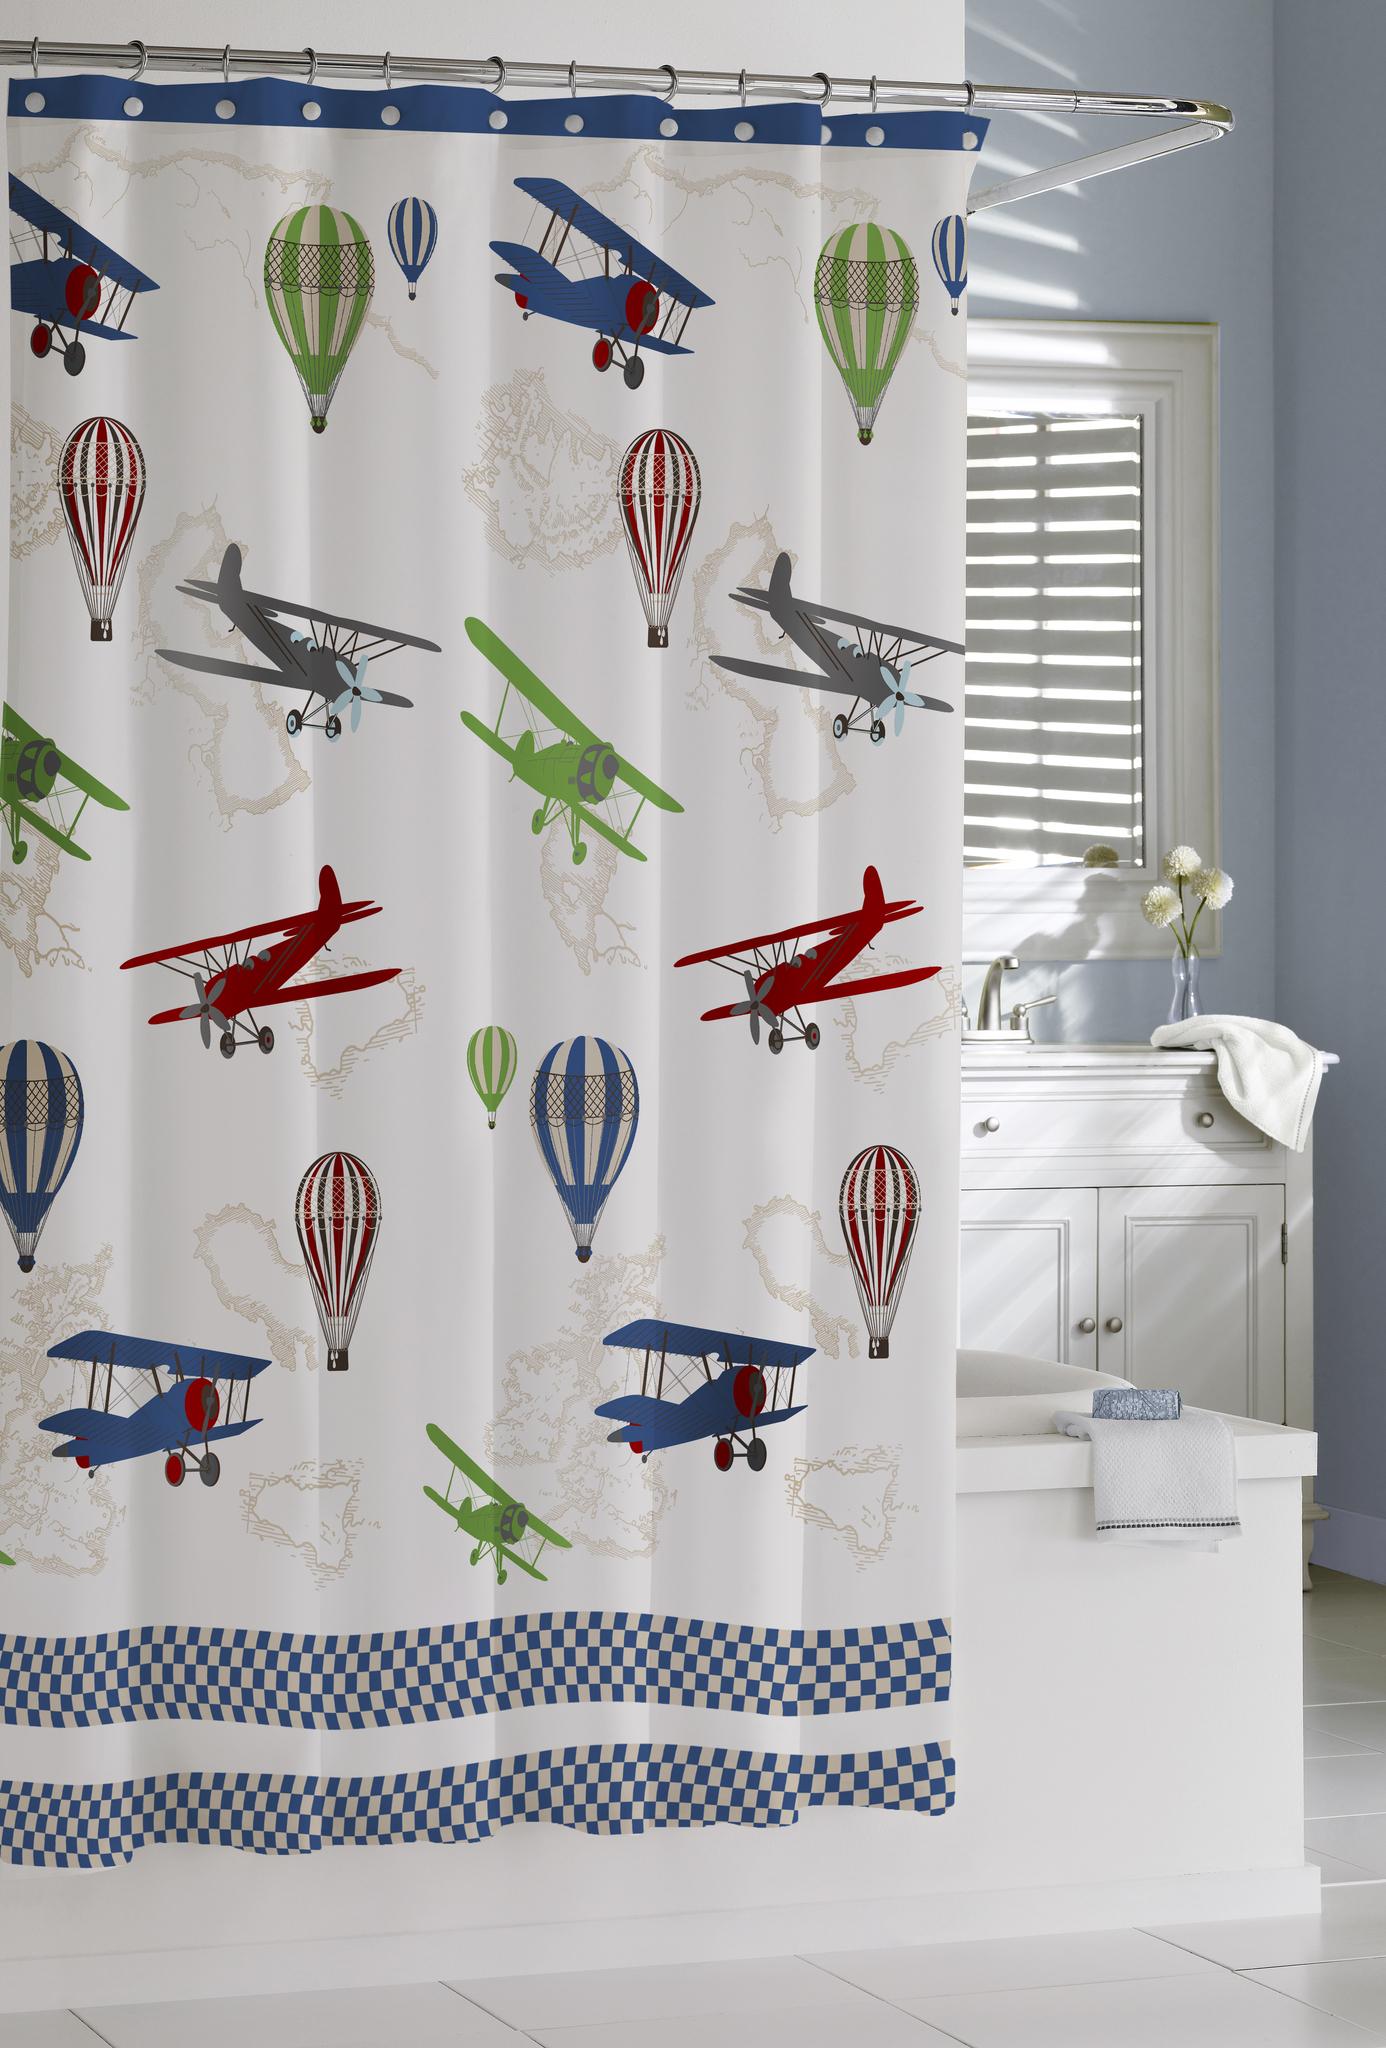 Шторки для ванной Шторка для ванной детская 183x183 Kassatex In Flight elitnaya-shtorka-dlya-vannoy-in-flight-ot-kassatex-ssha-kitay.jpg